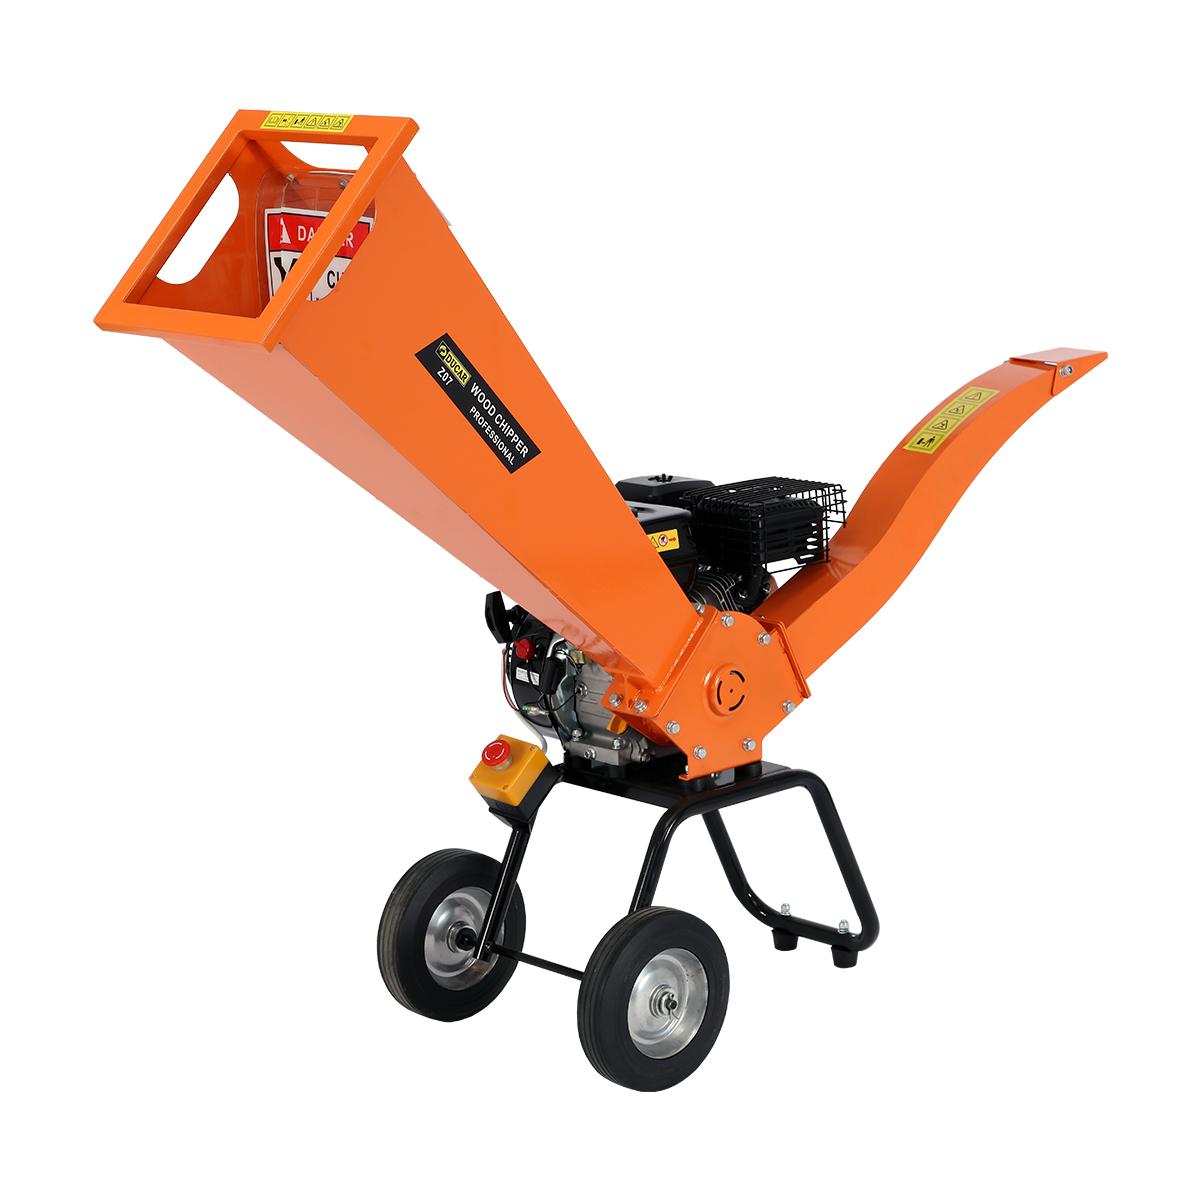 Ducar 7HP Wood Chipper Shredder Mulcher Grinder Petrol Orange